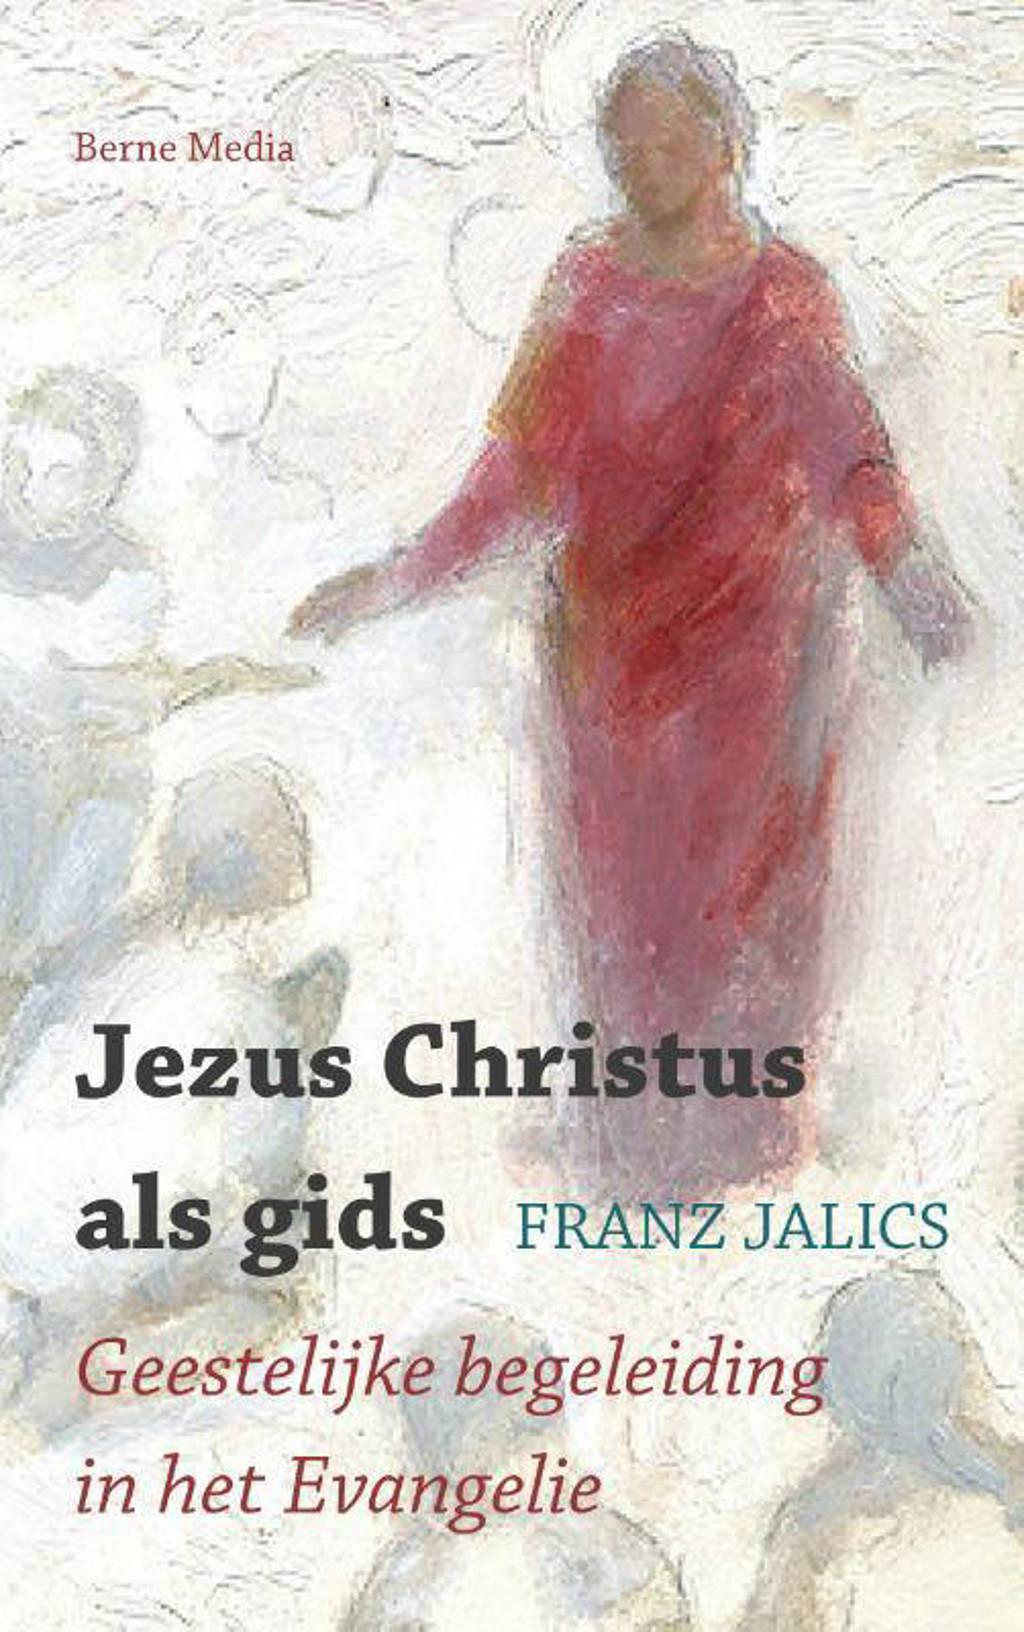 Jezus Christus als gids - Franz Jalics